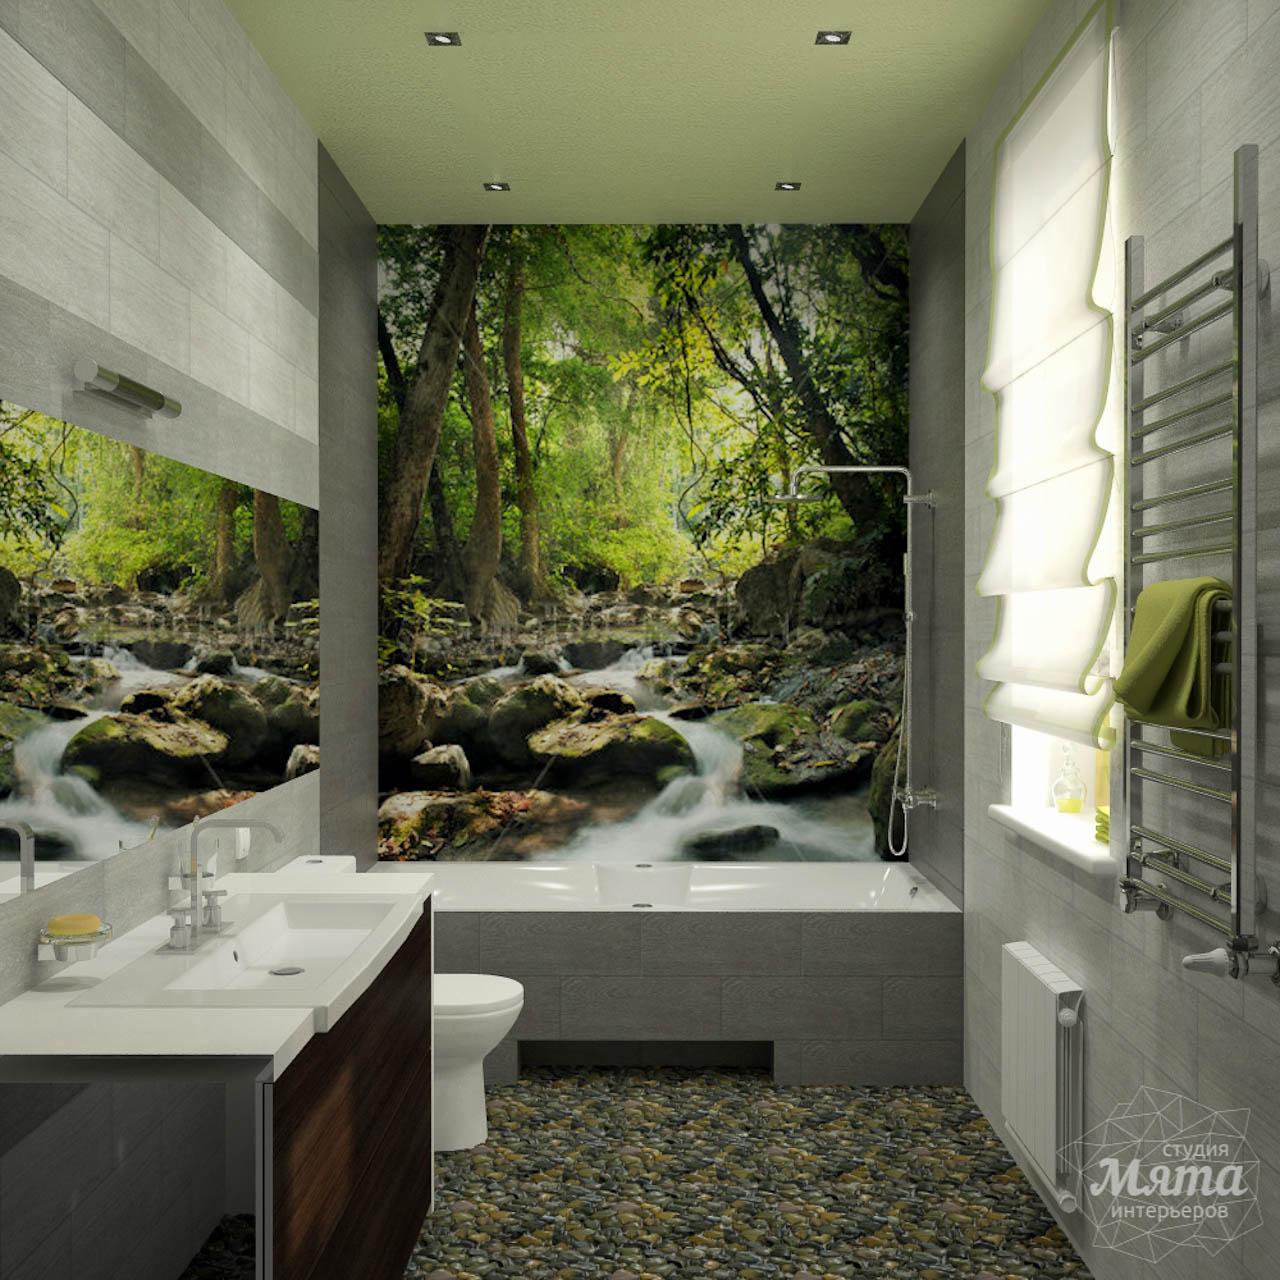 Дизайн проект интерьера коттеджа  в стиле минимализм по ул. Барвинка 15 img1842279783